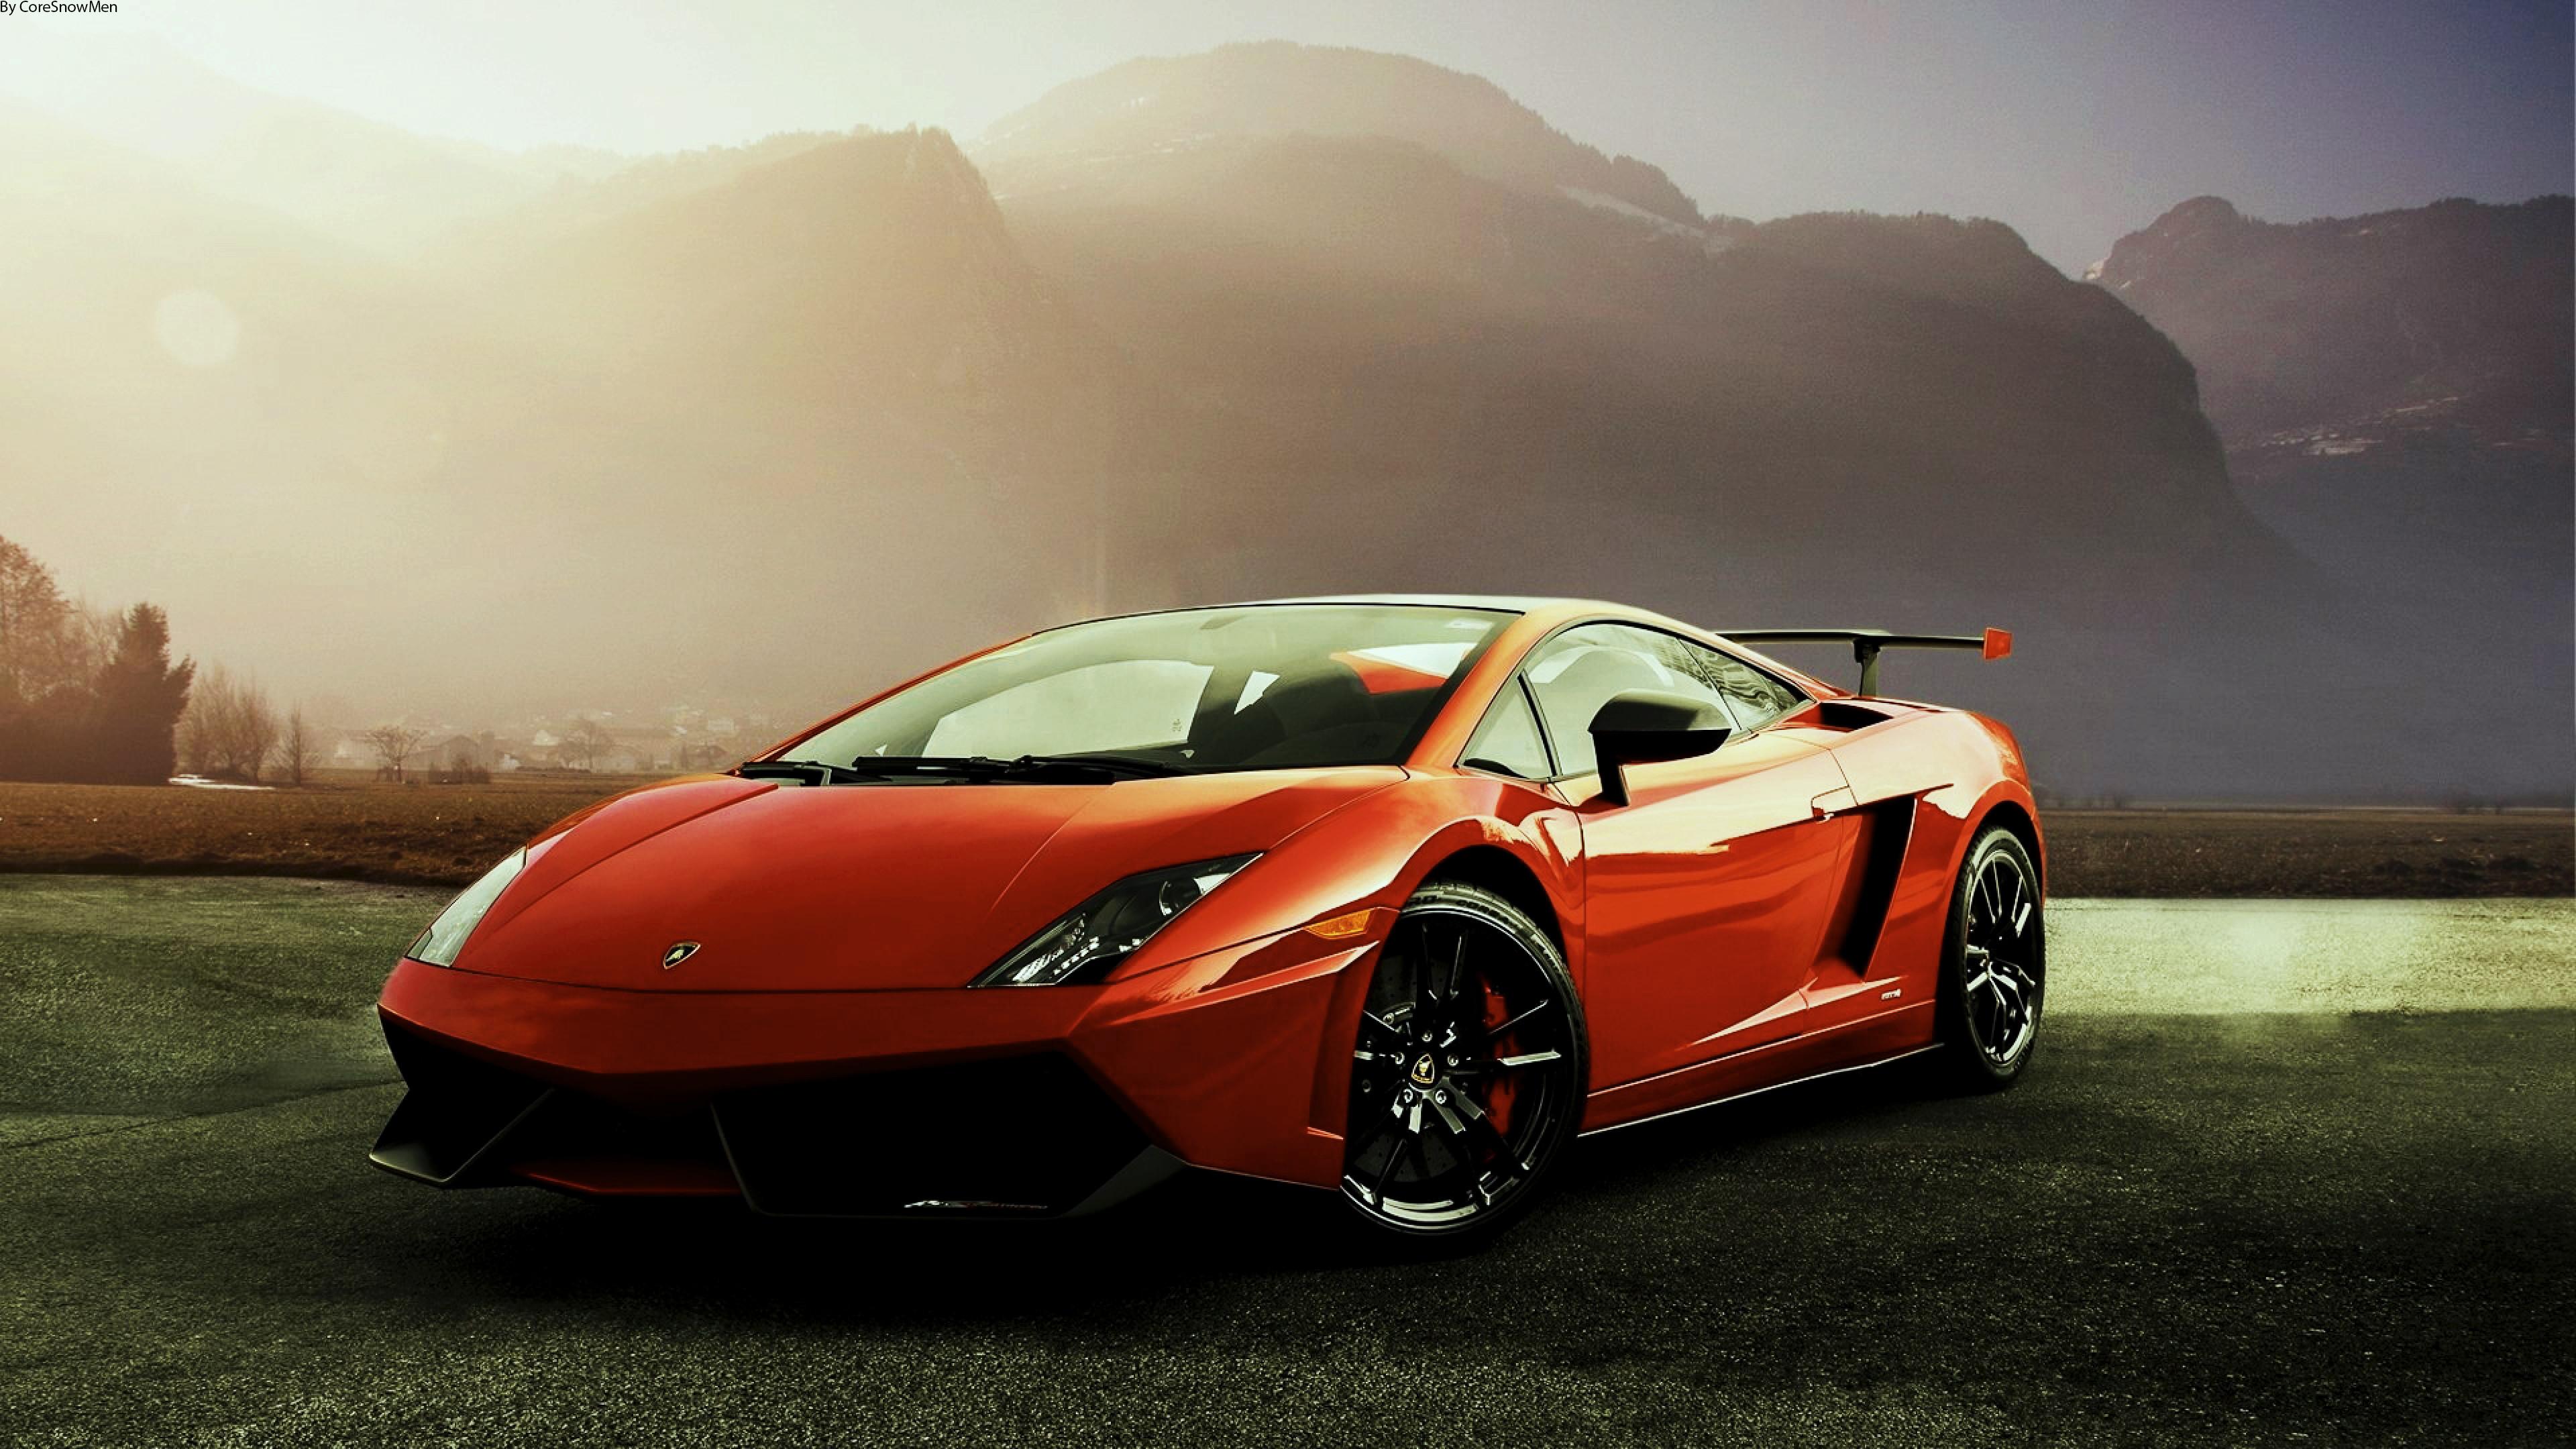 2048x1152 Newest Sports Car Wallpaper Lamborghini By Images T2yx With Sports  Car Wallpaper On Favorite